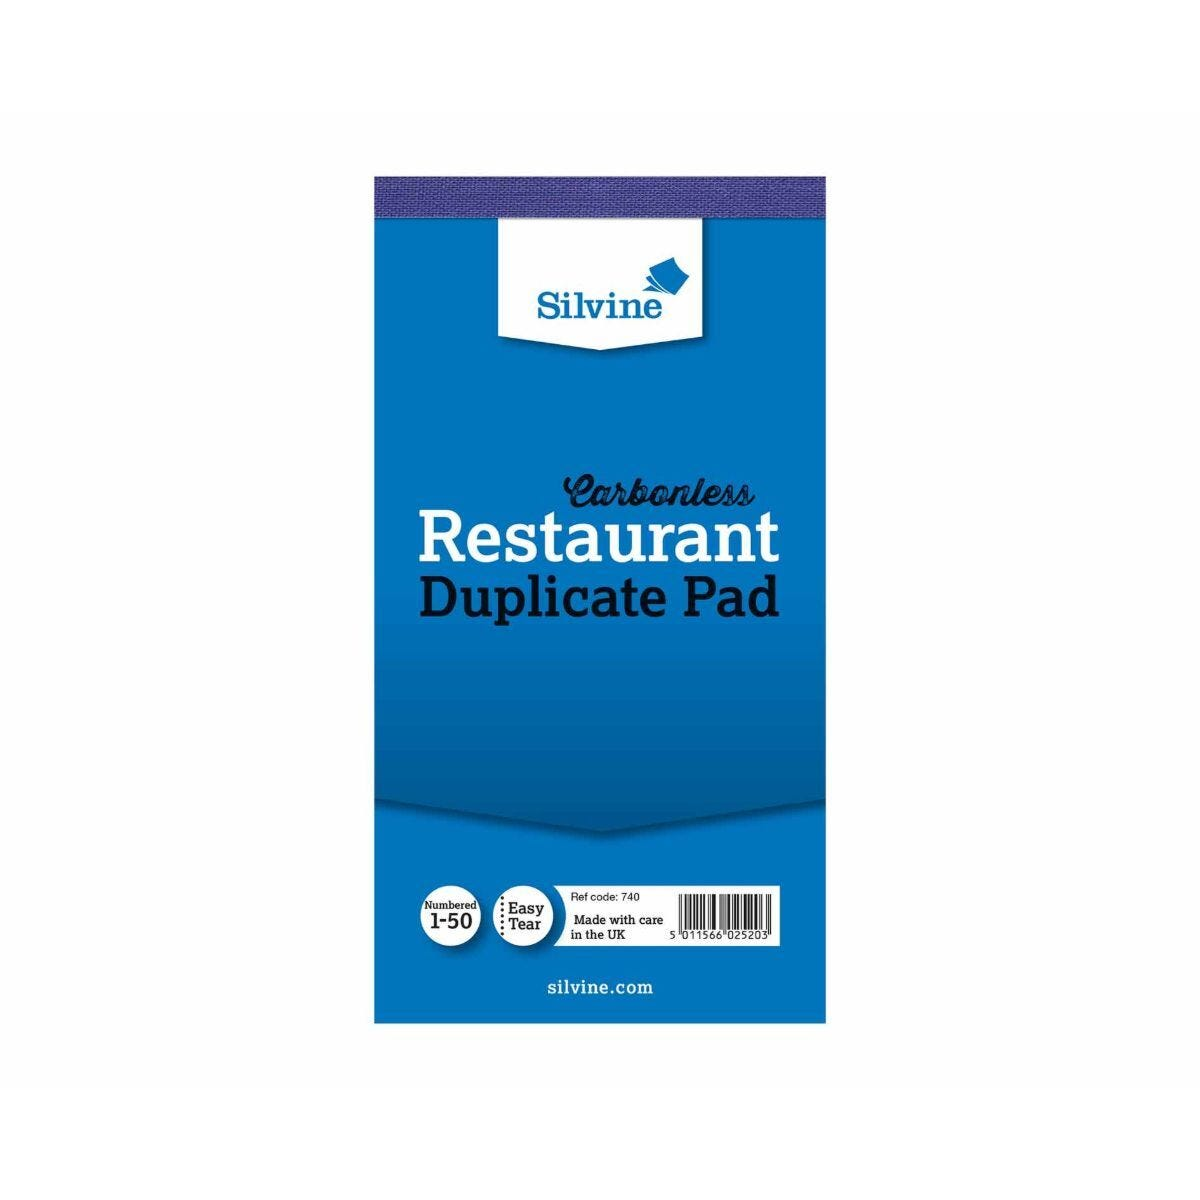 Silvine Duplicate Carbonless Restaurant Pad No.1-50